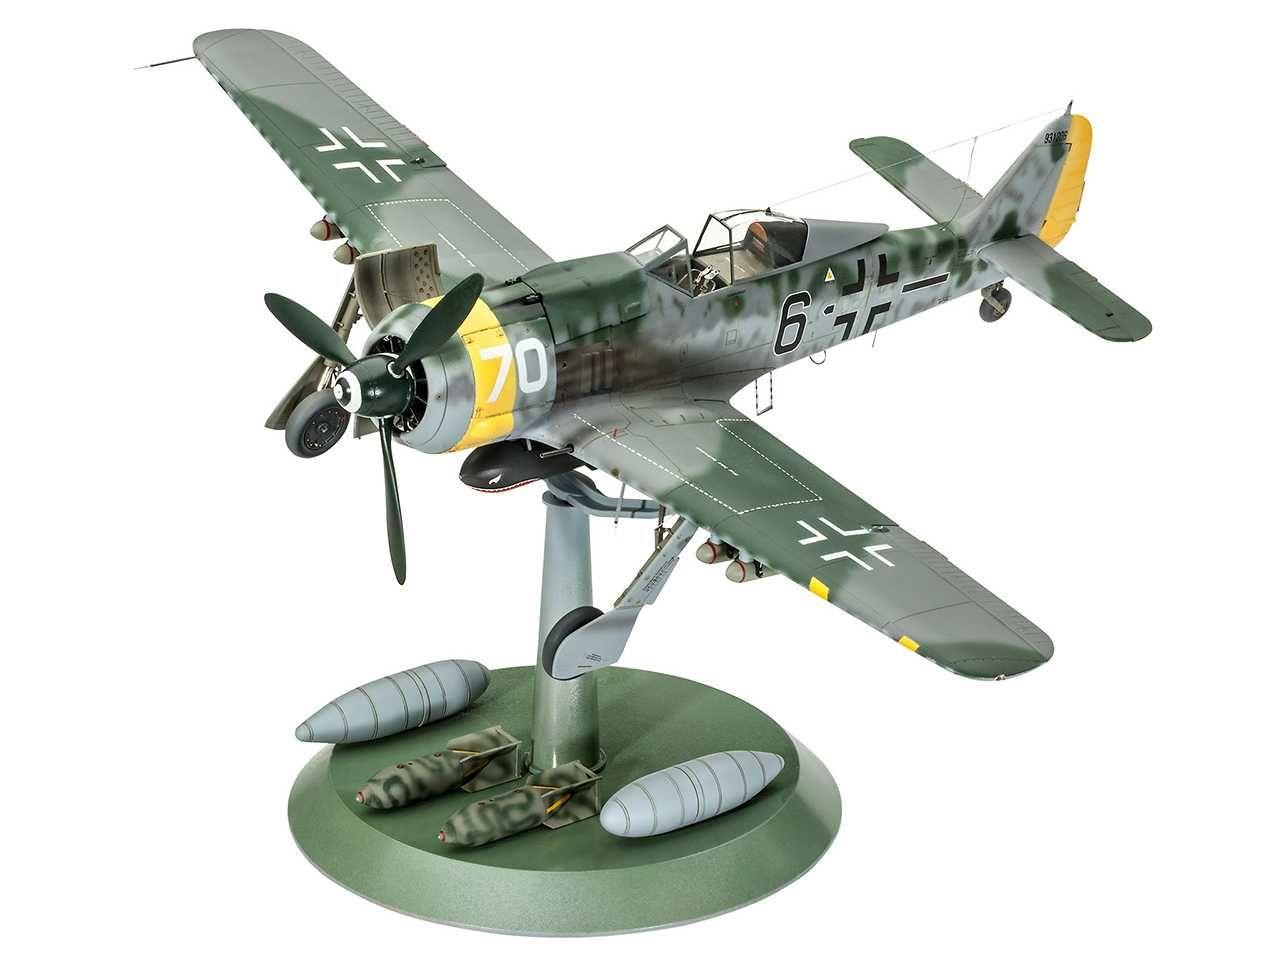 Plastic ModelKit letadlo 04869 - Focke Wulf Fw190 F-8 (1:32) Plastikové modely